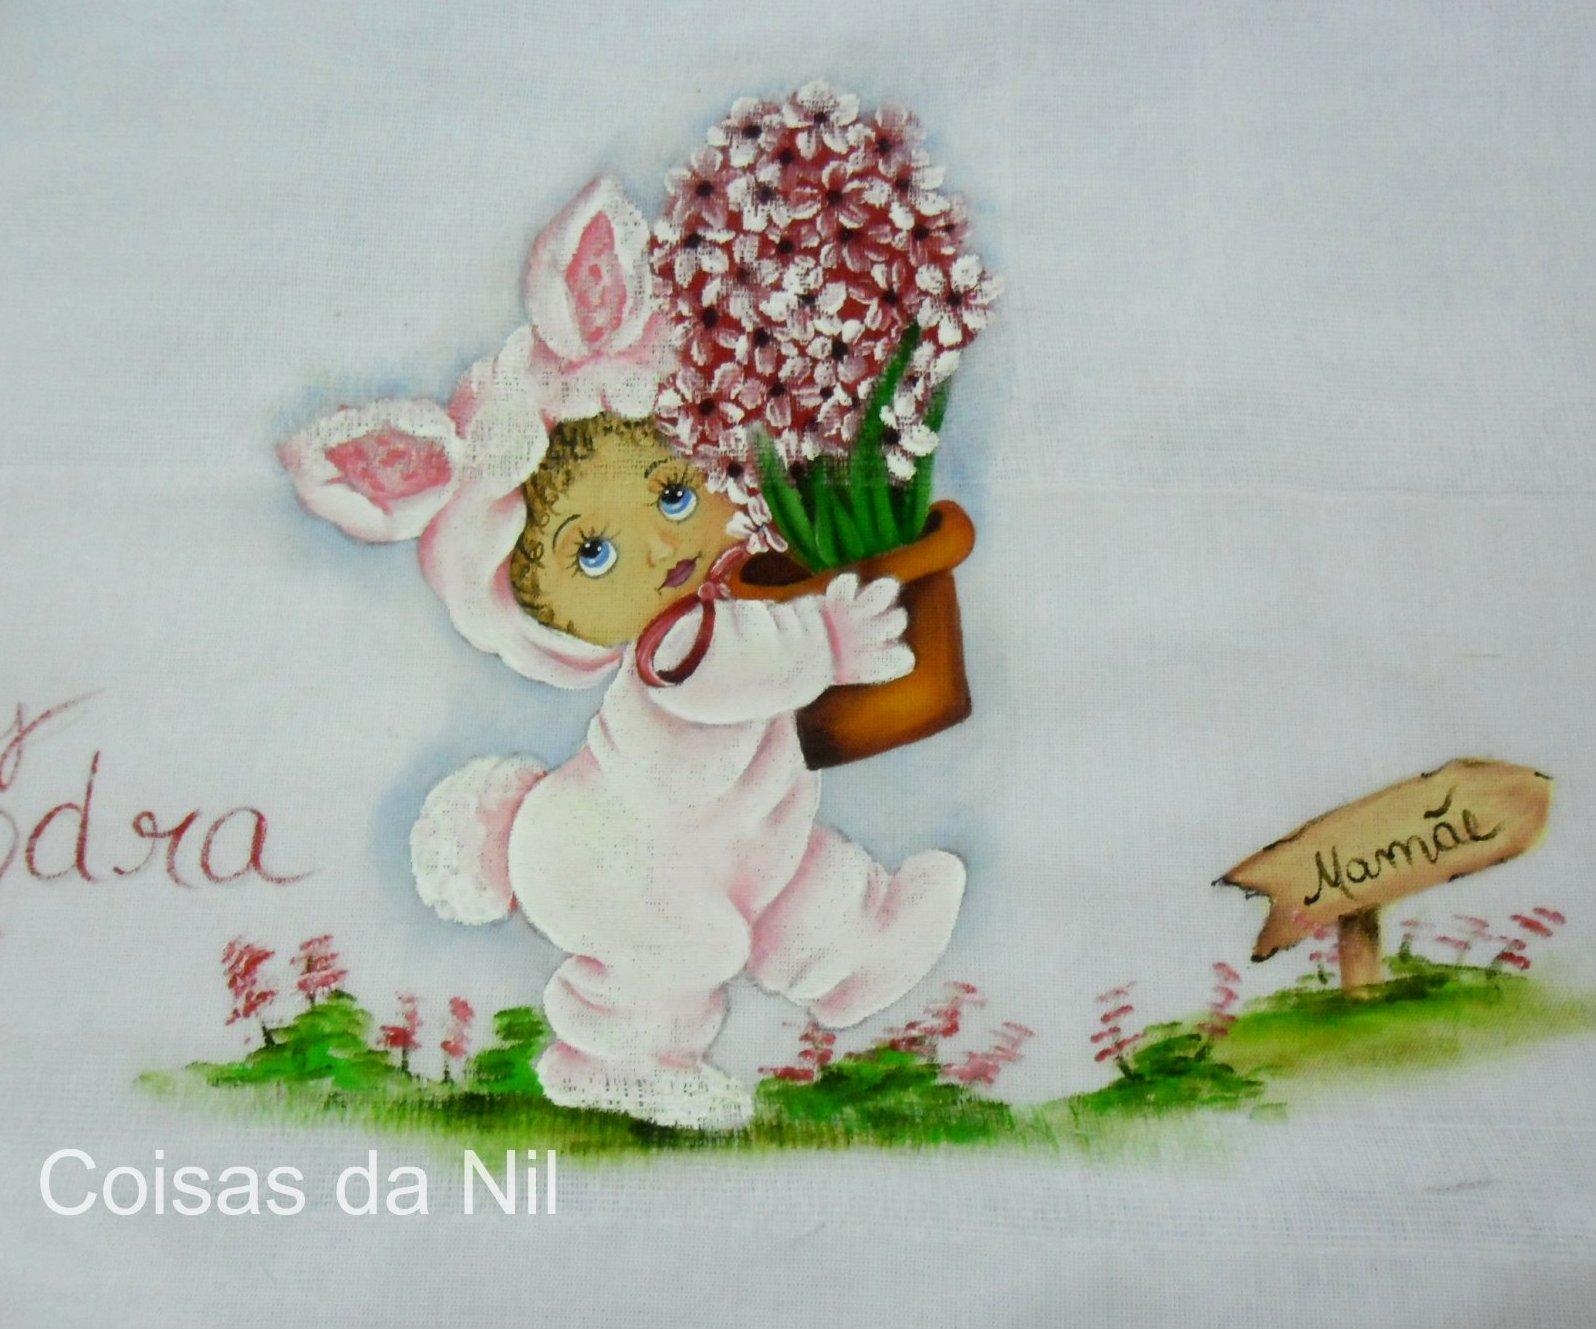 http://nilzozo.blogspot.com/2012/08/fralda-pintada-para-menina_17.html